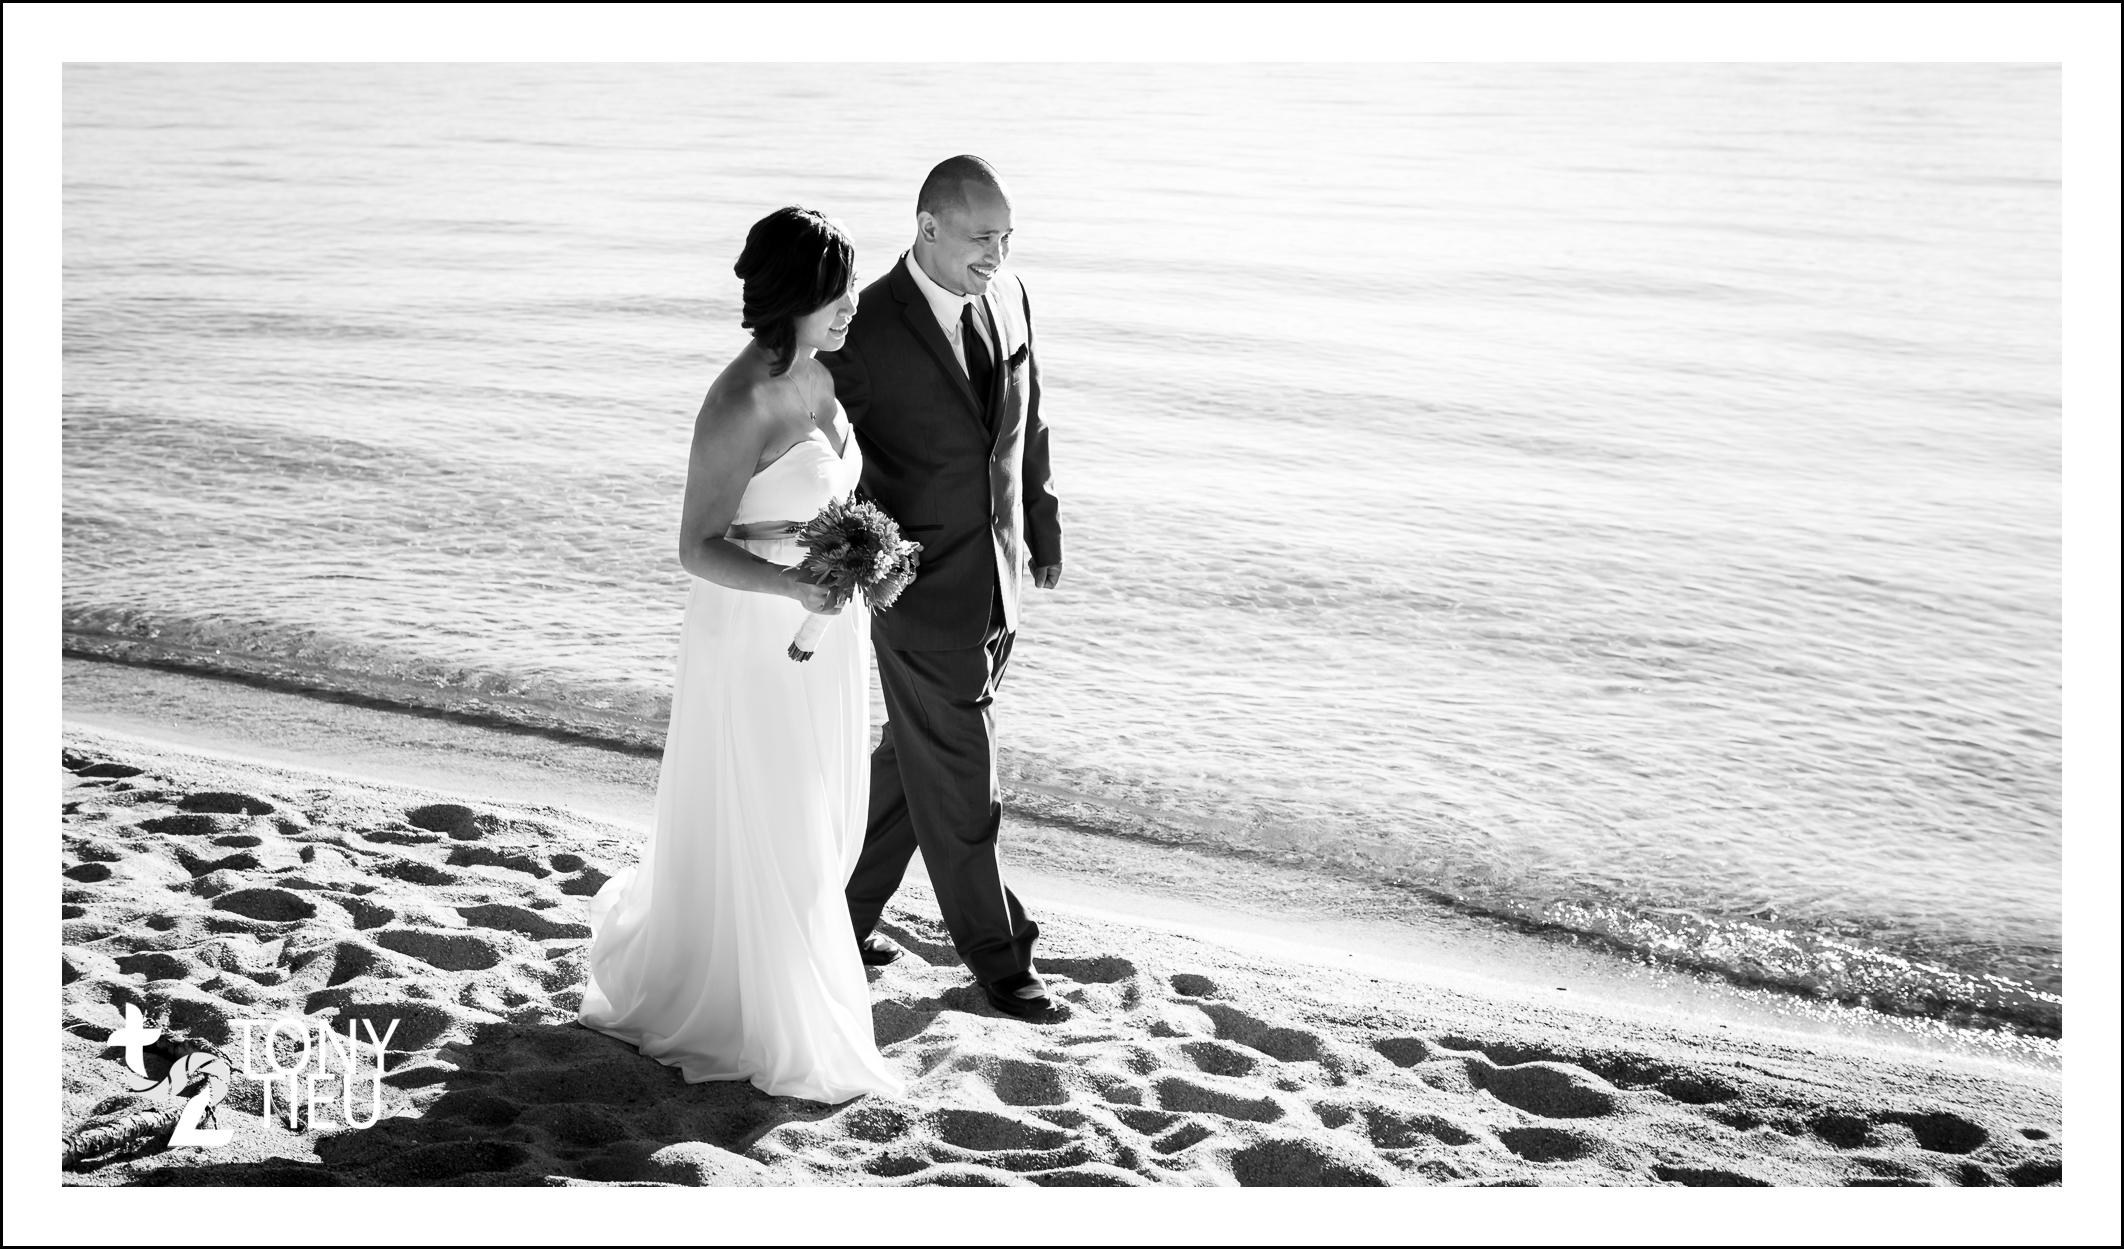 Tony_Tieu_Alyssa_ Wedding_4